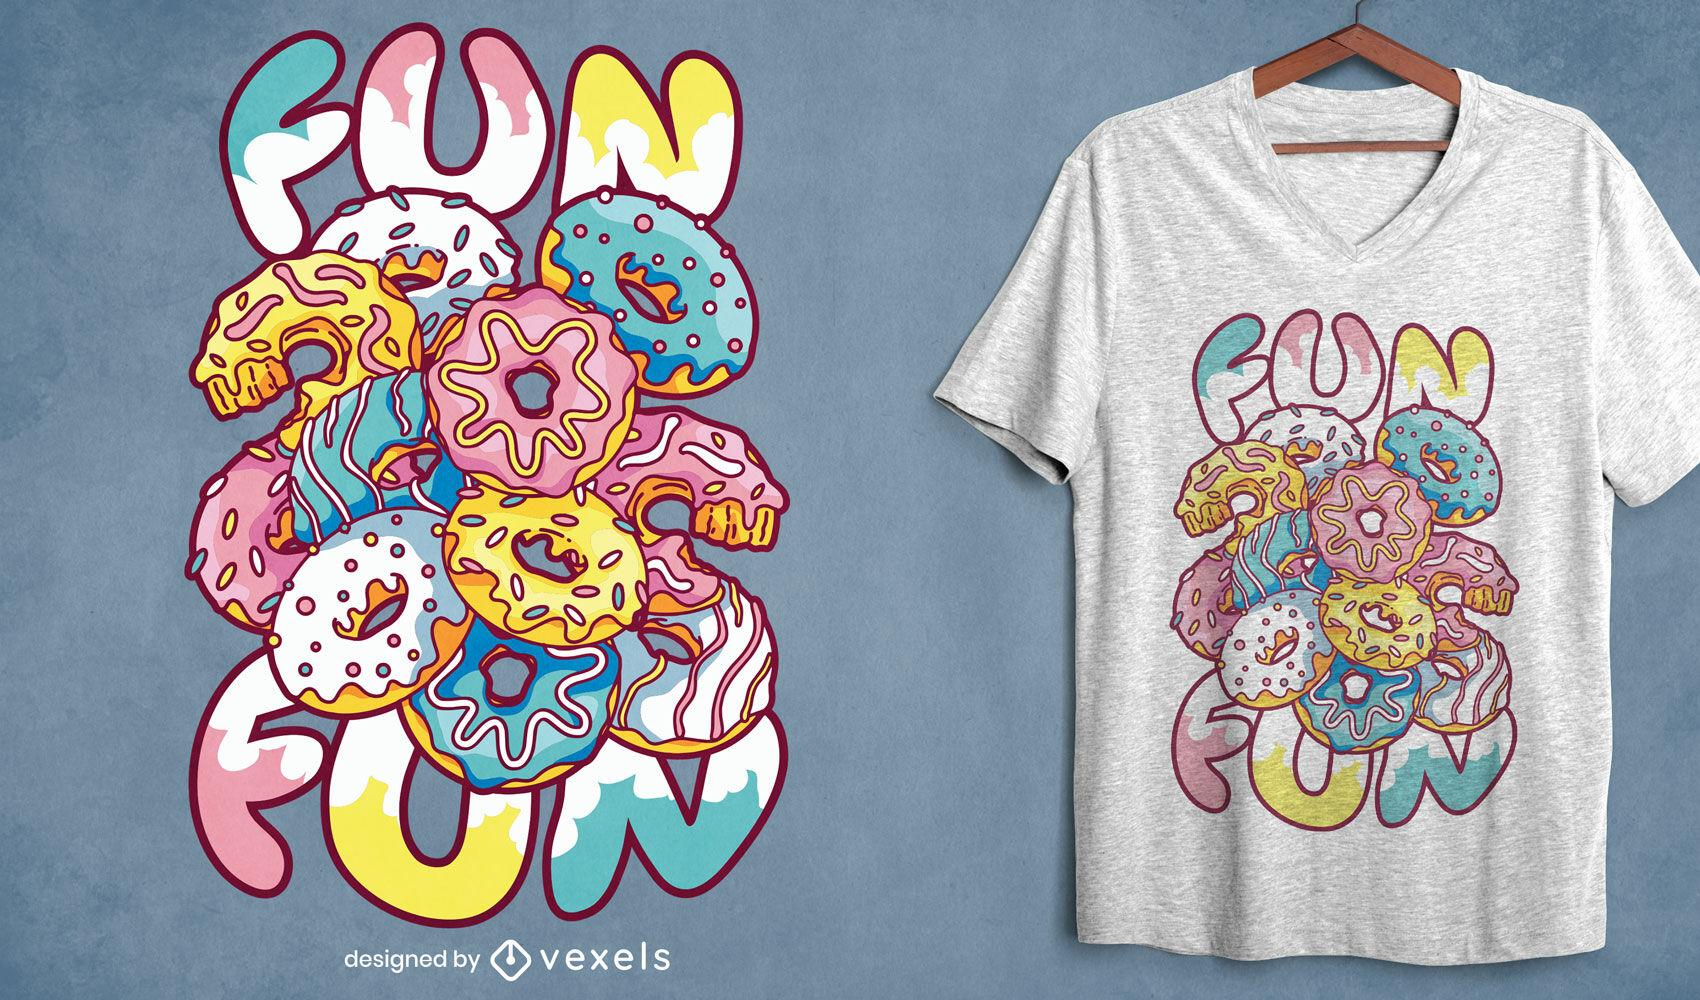 Fun donuts t-shirt design